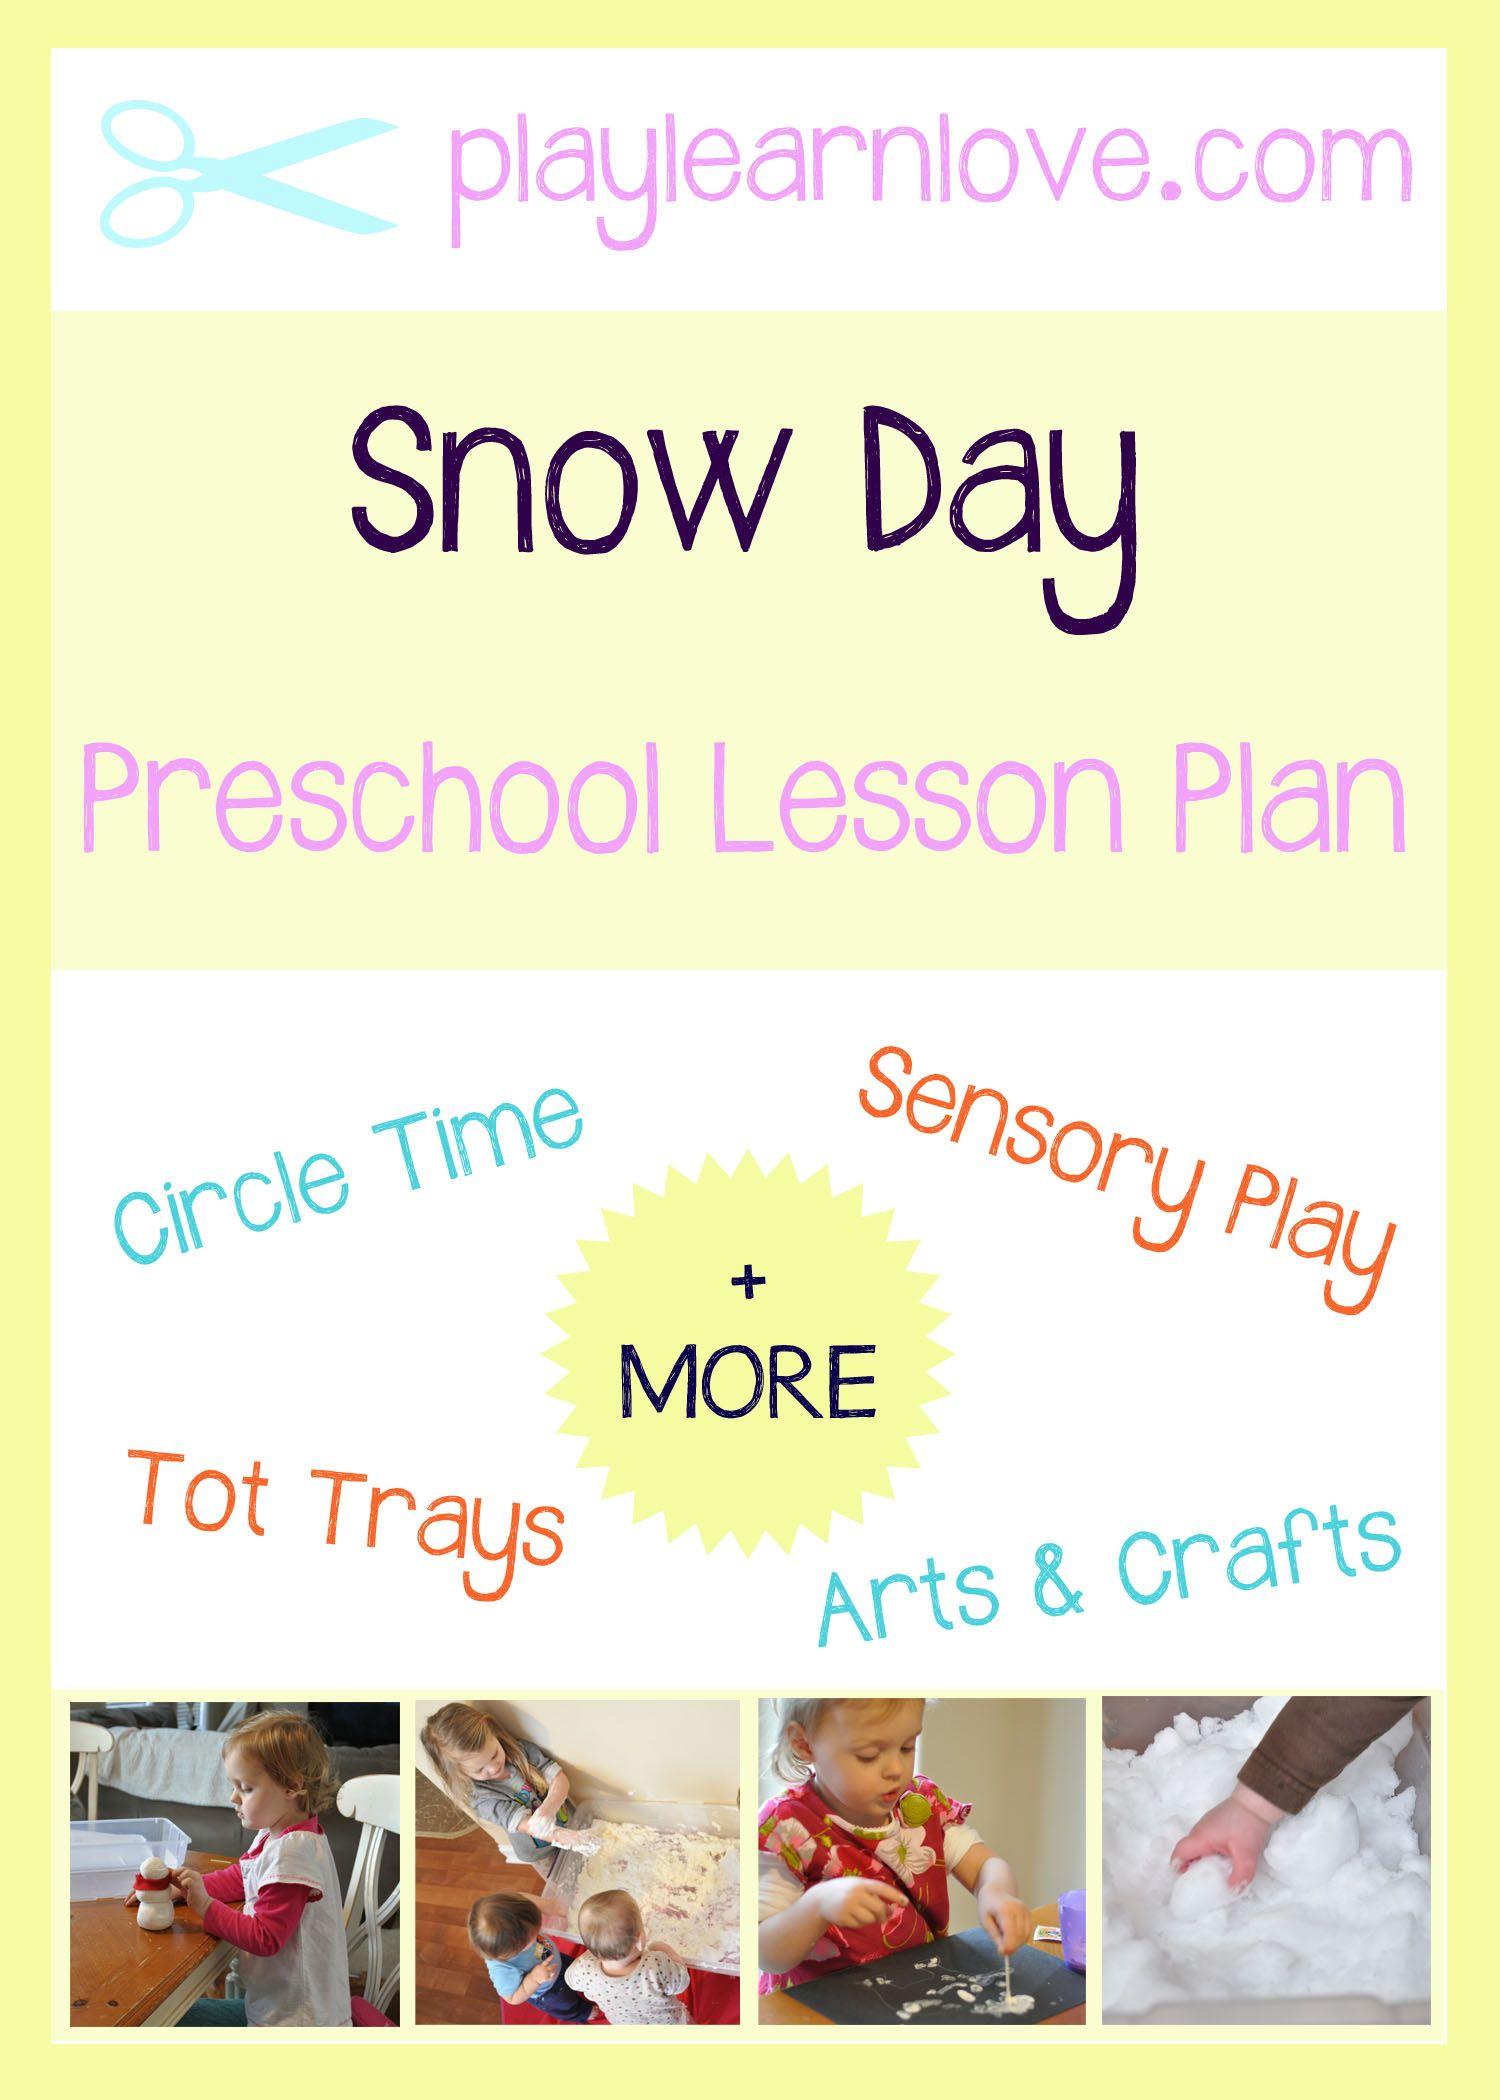 Snow Day Lesson Plan